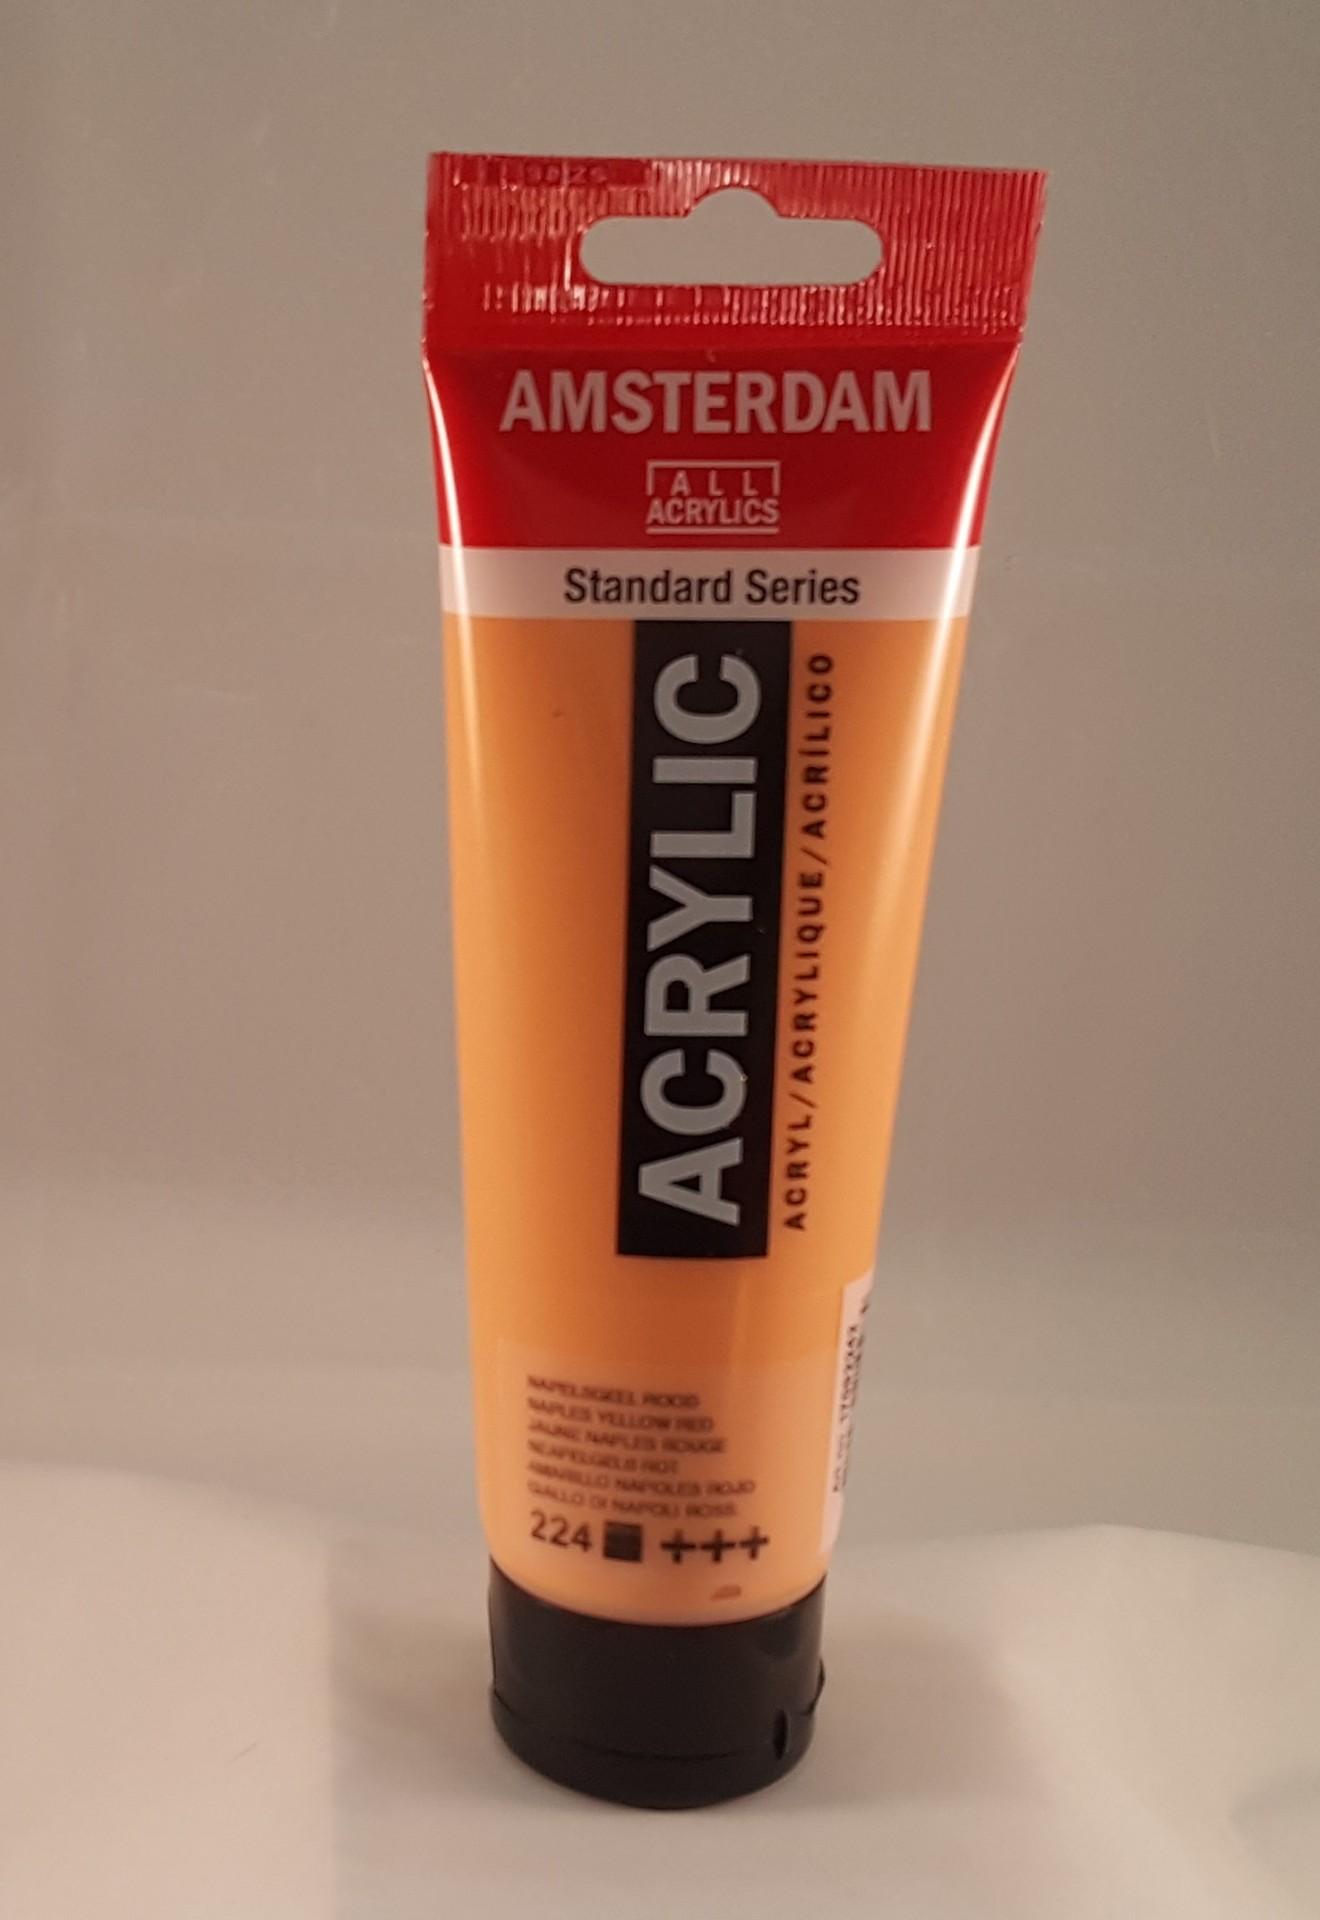 Tinta Acrílica Amsterdam 224